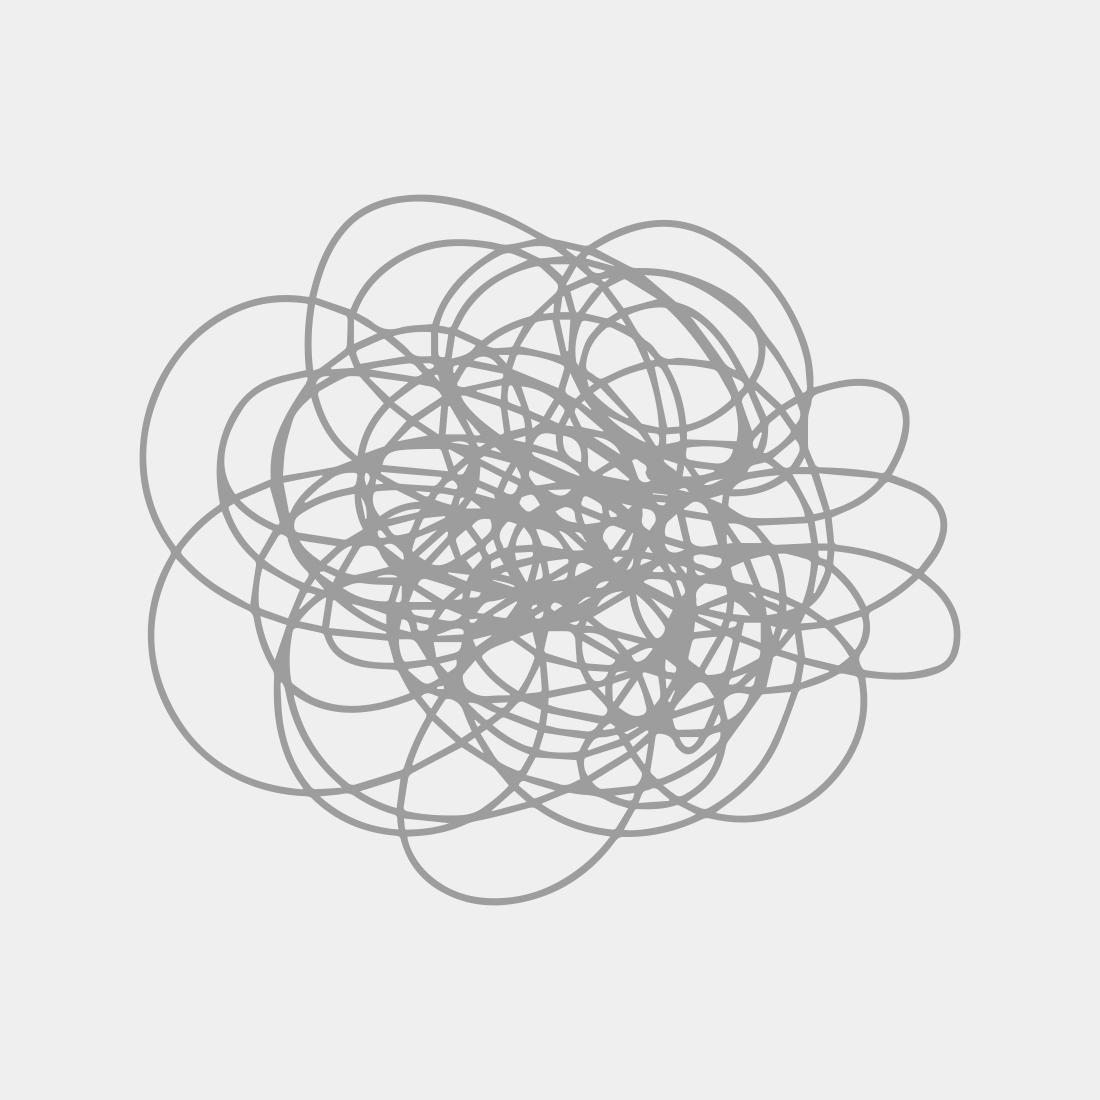 Picasso Stein Correspondence